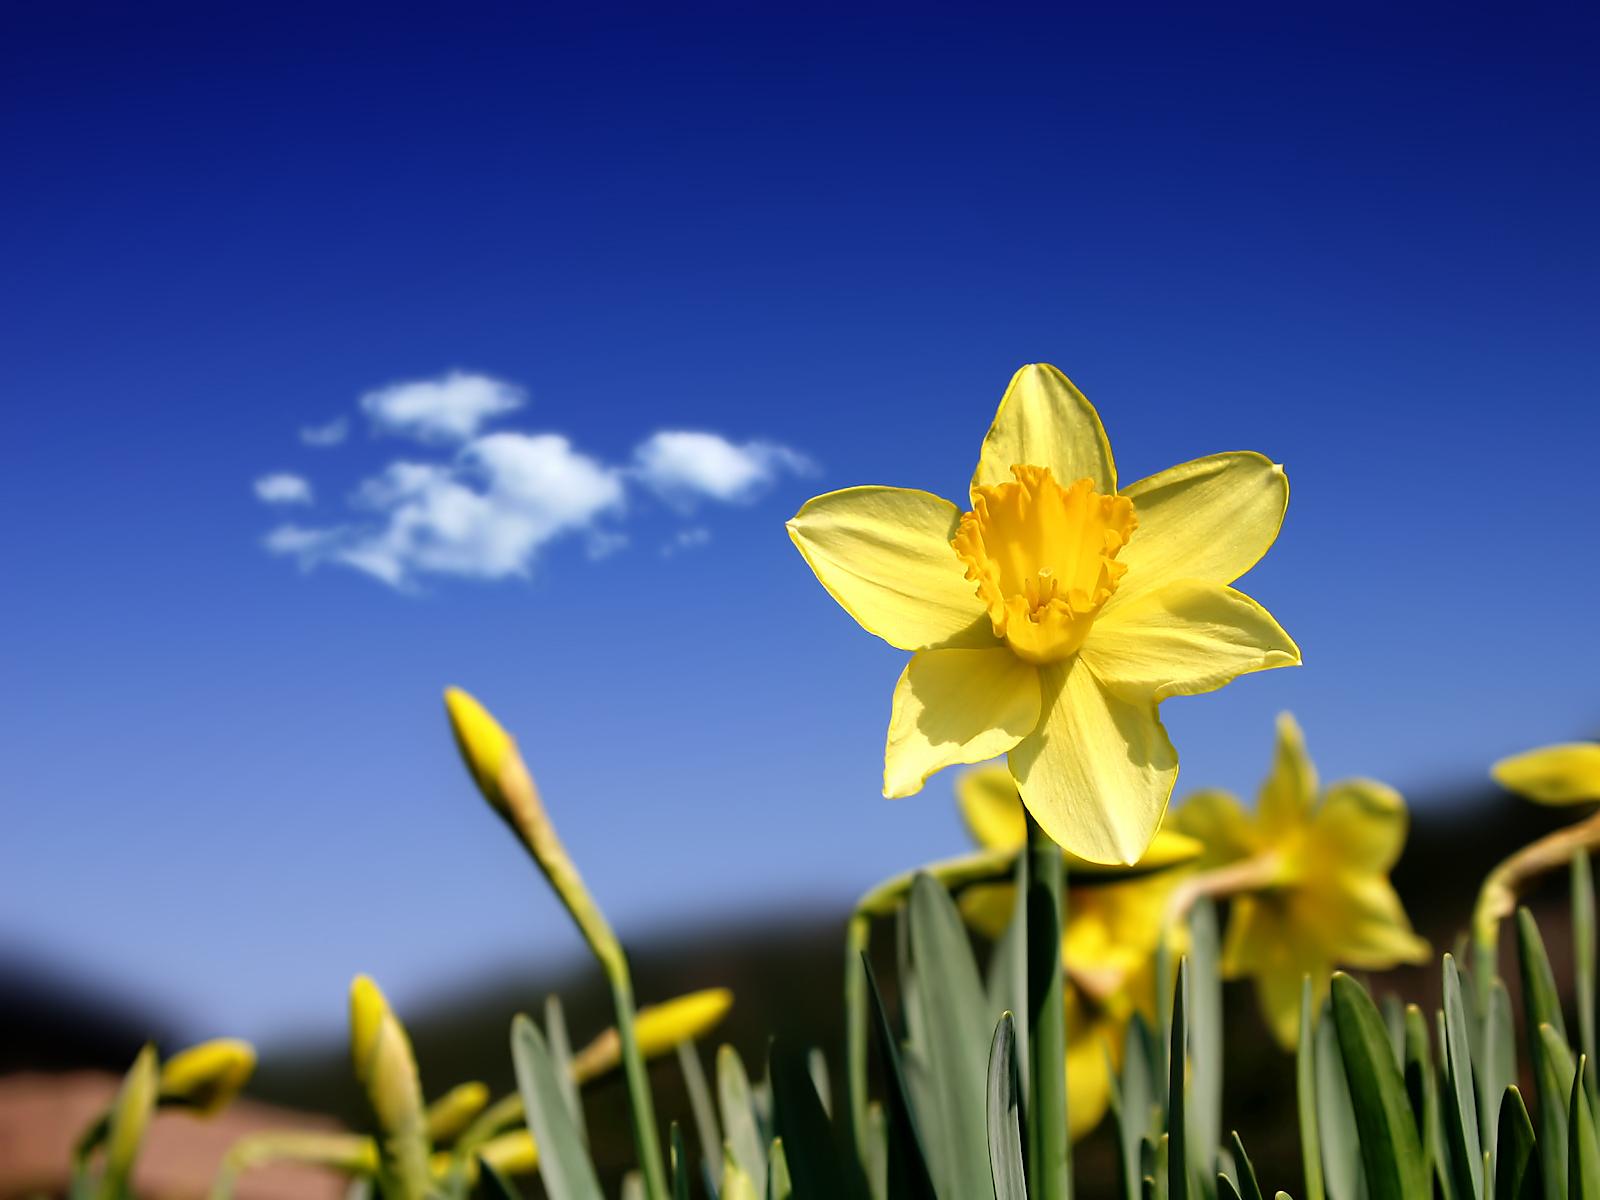 1600x1200 Beautiful daffodils desktop PC and Mac wallpaper 1600x1200